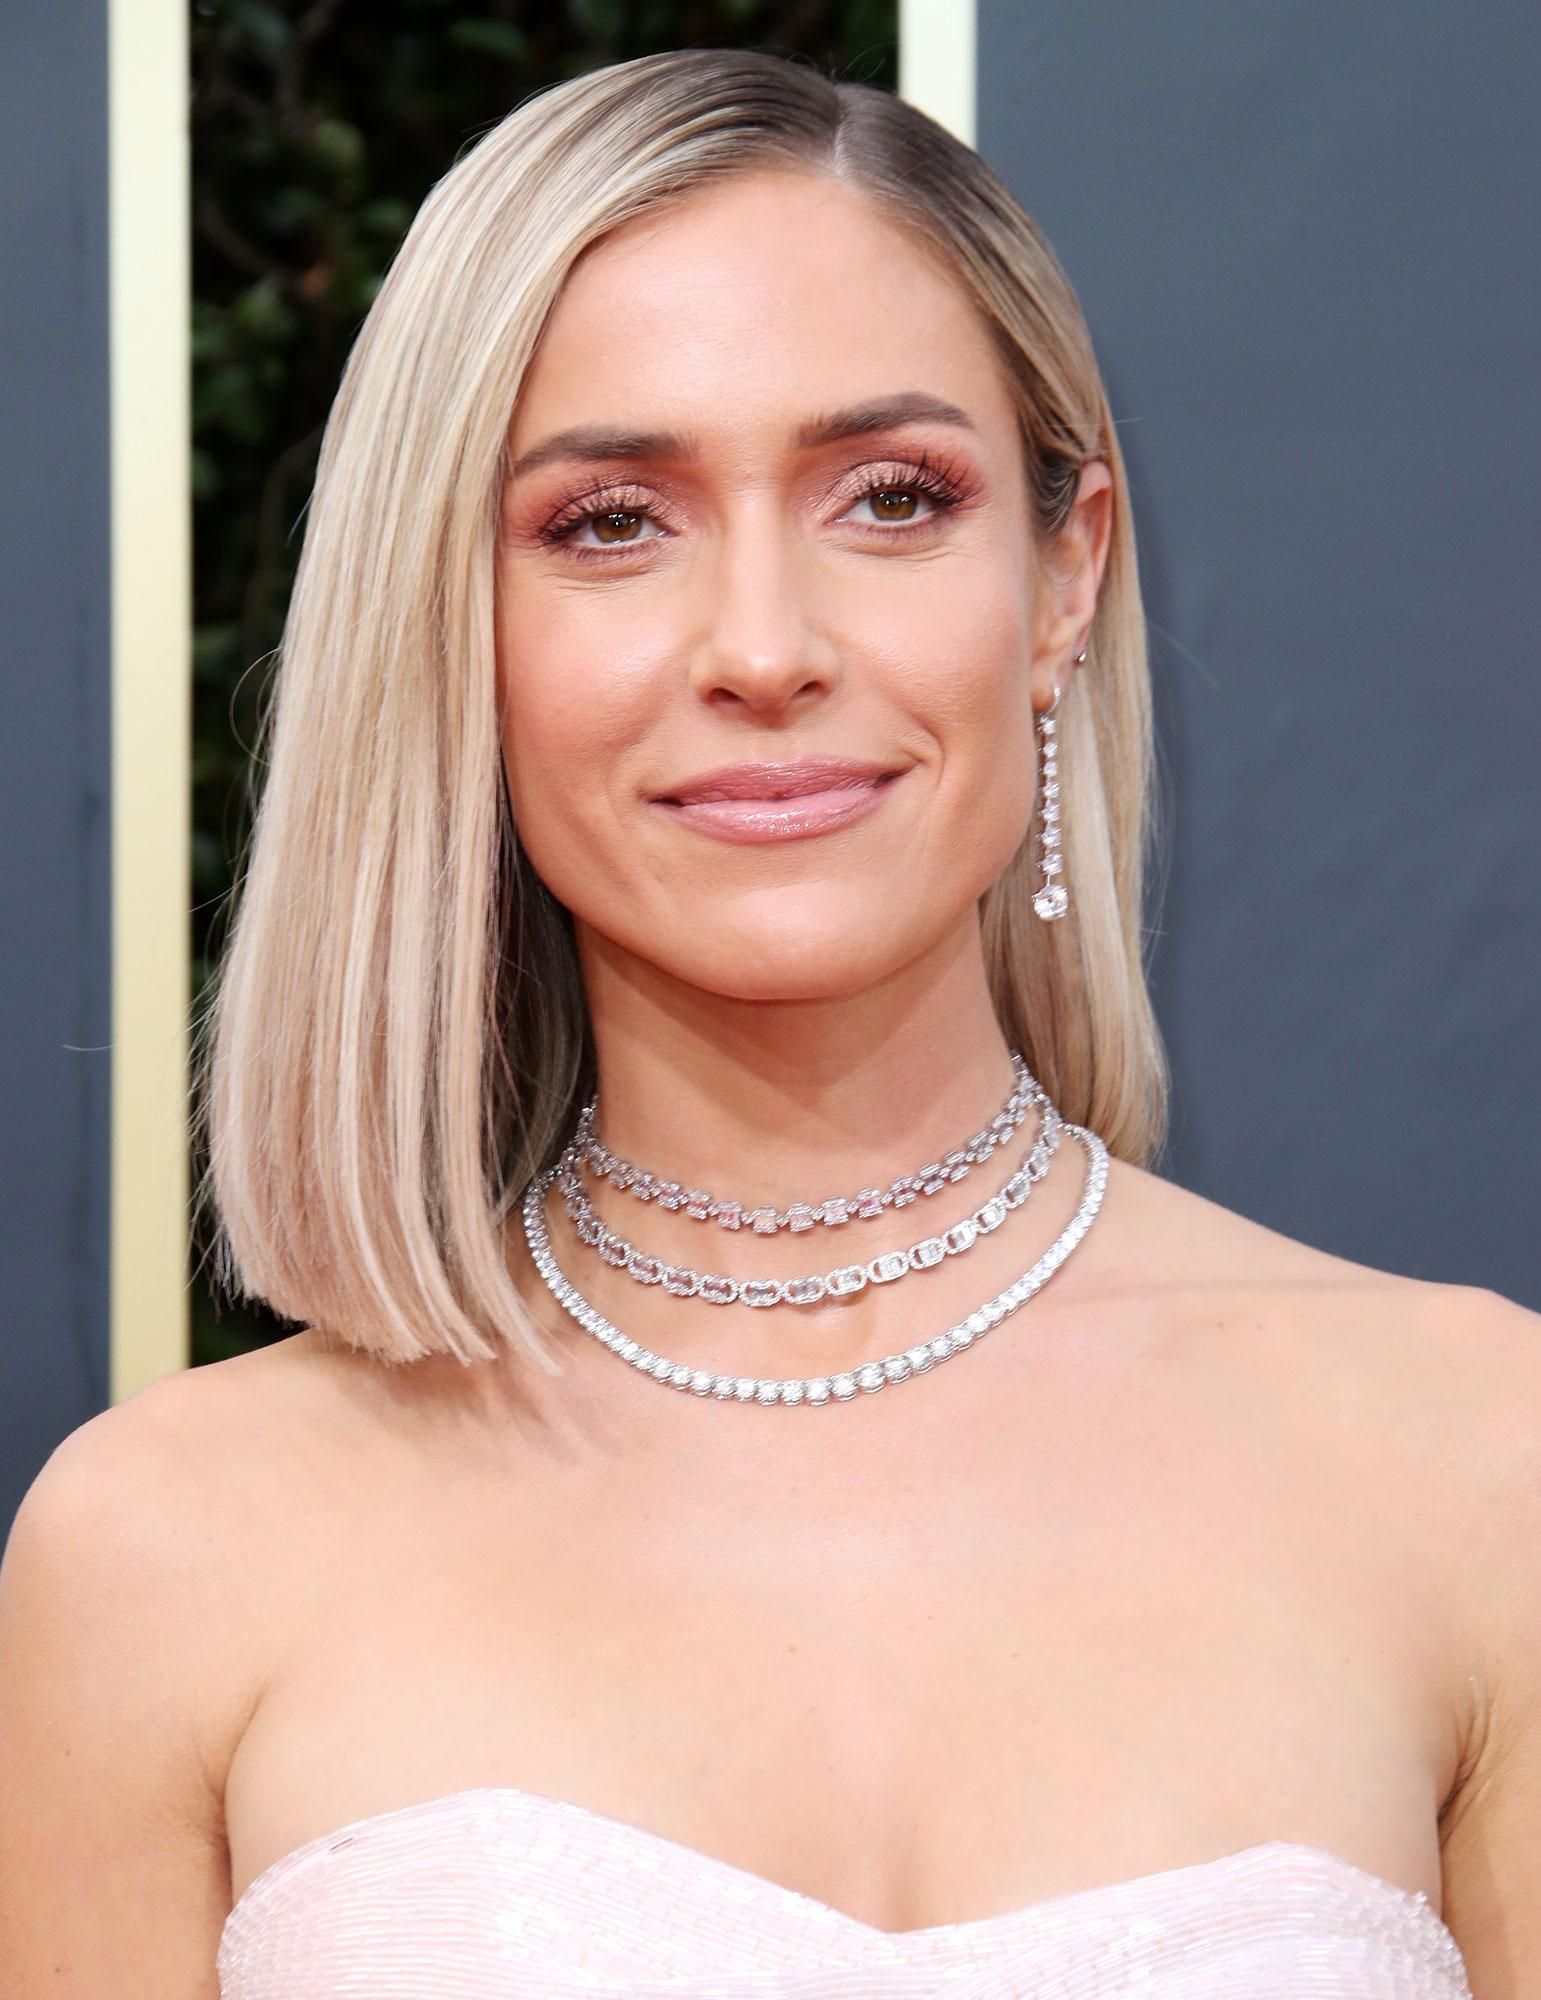 Golden Globes 2020 Best Beauty Hair Makeup On The Red Carpet